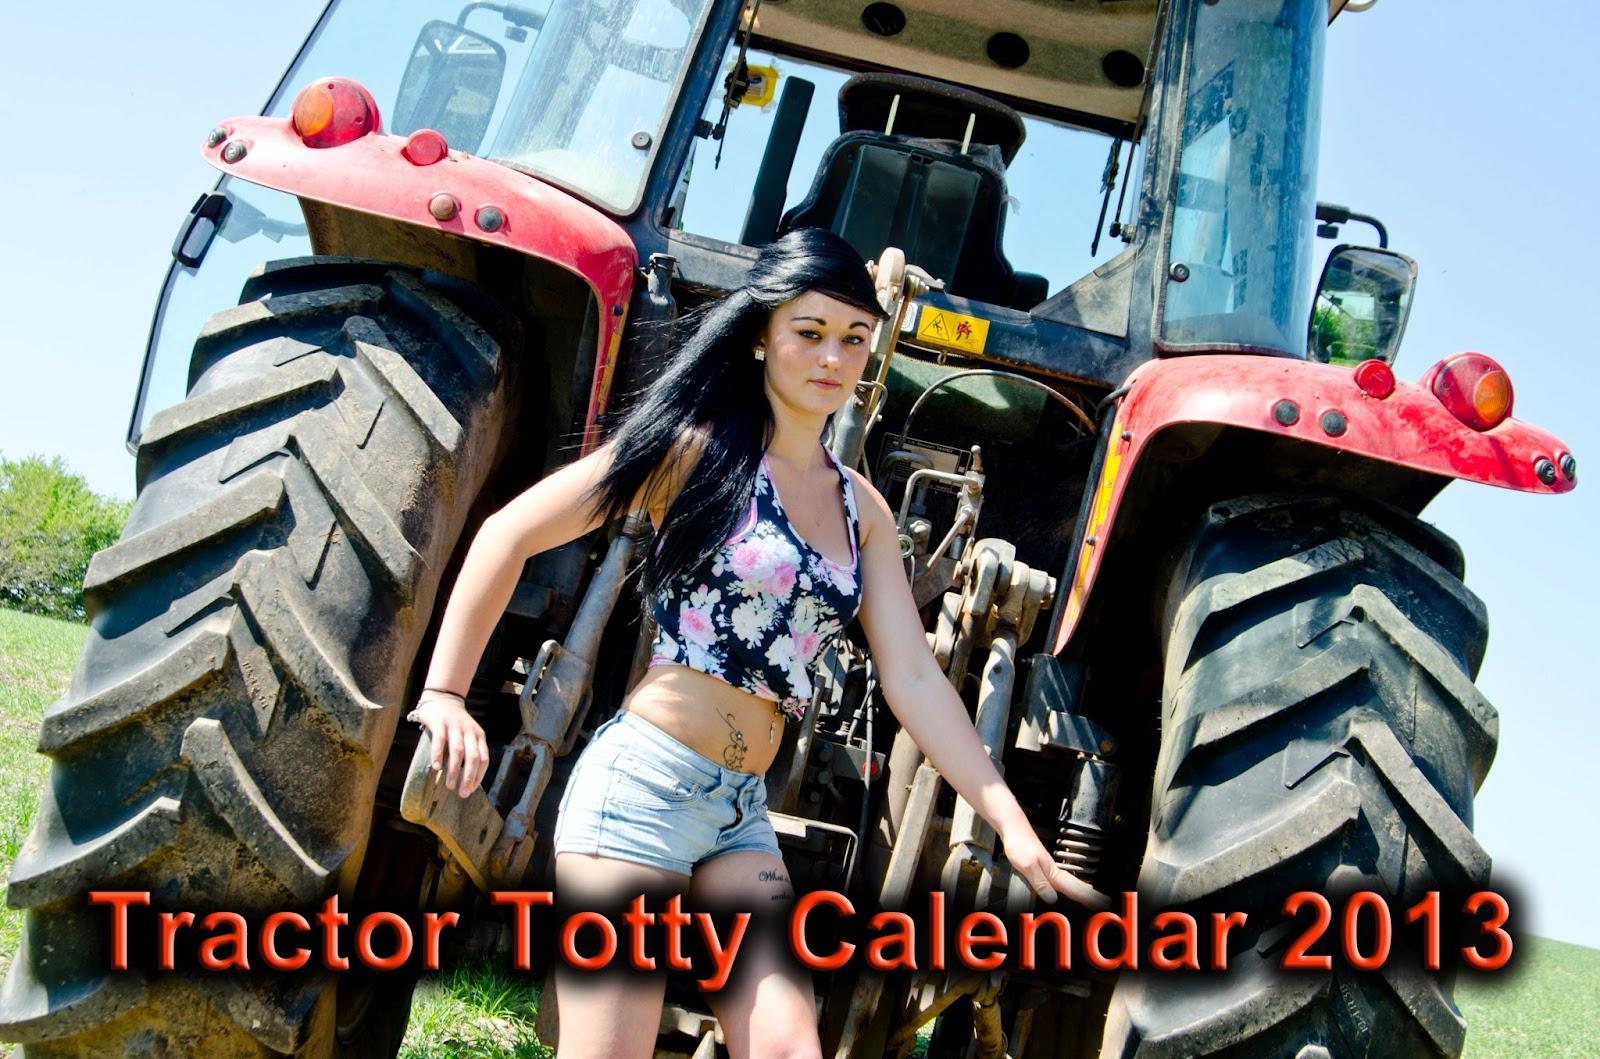 Tractor+Totty+Calendar+2013+-+Calendarshub.com+(3).jpg